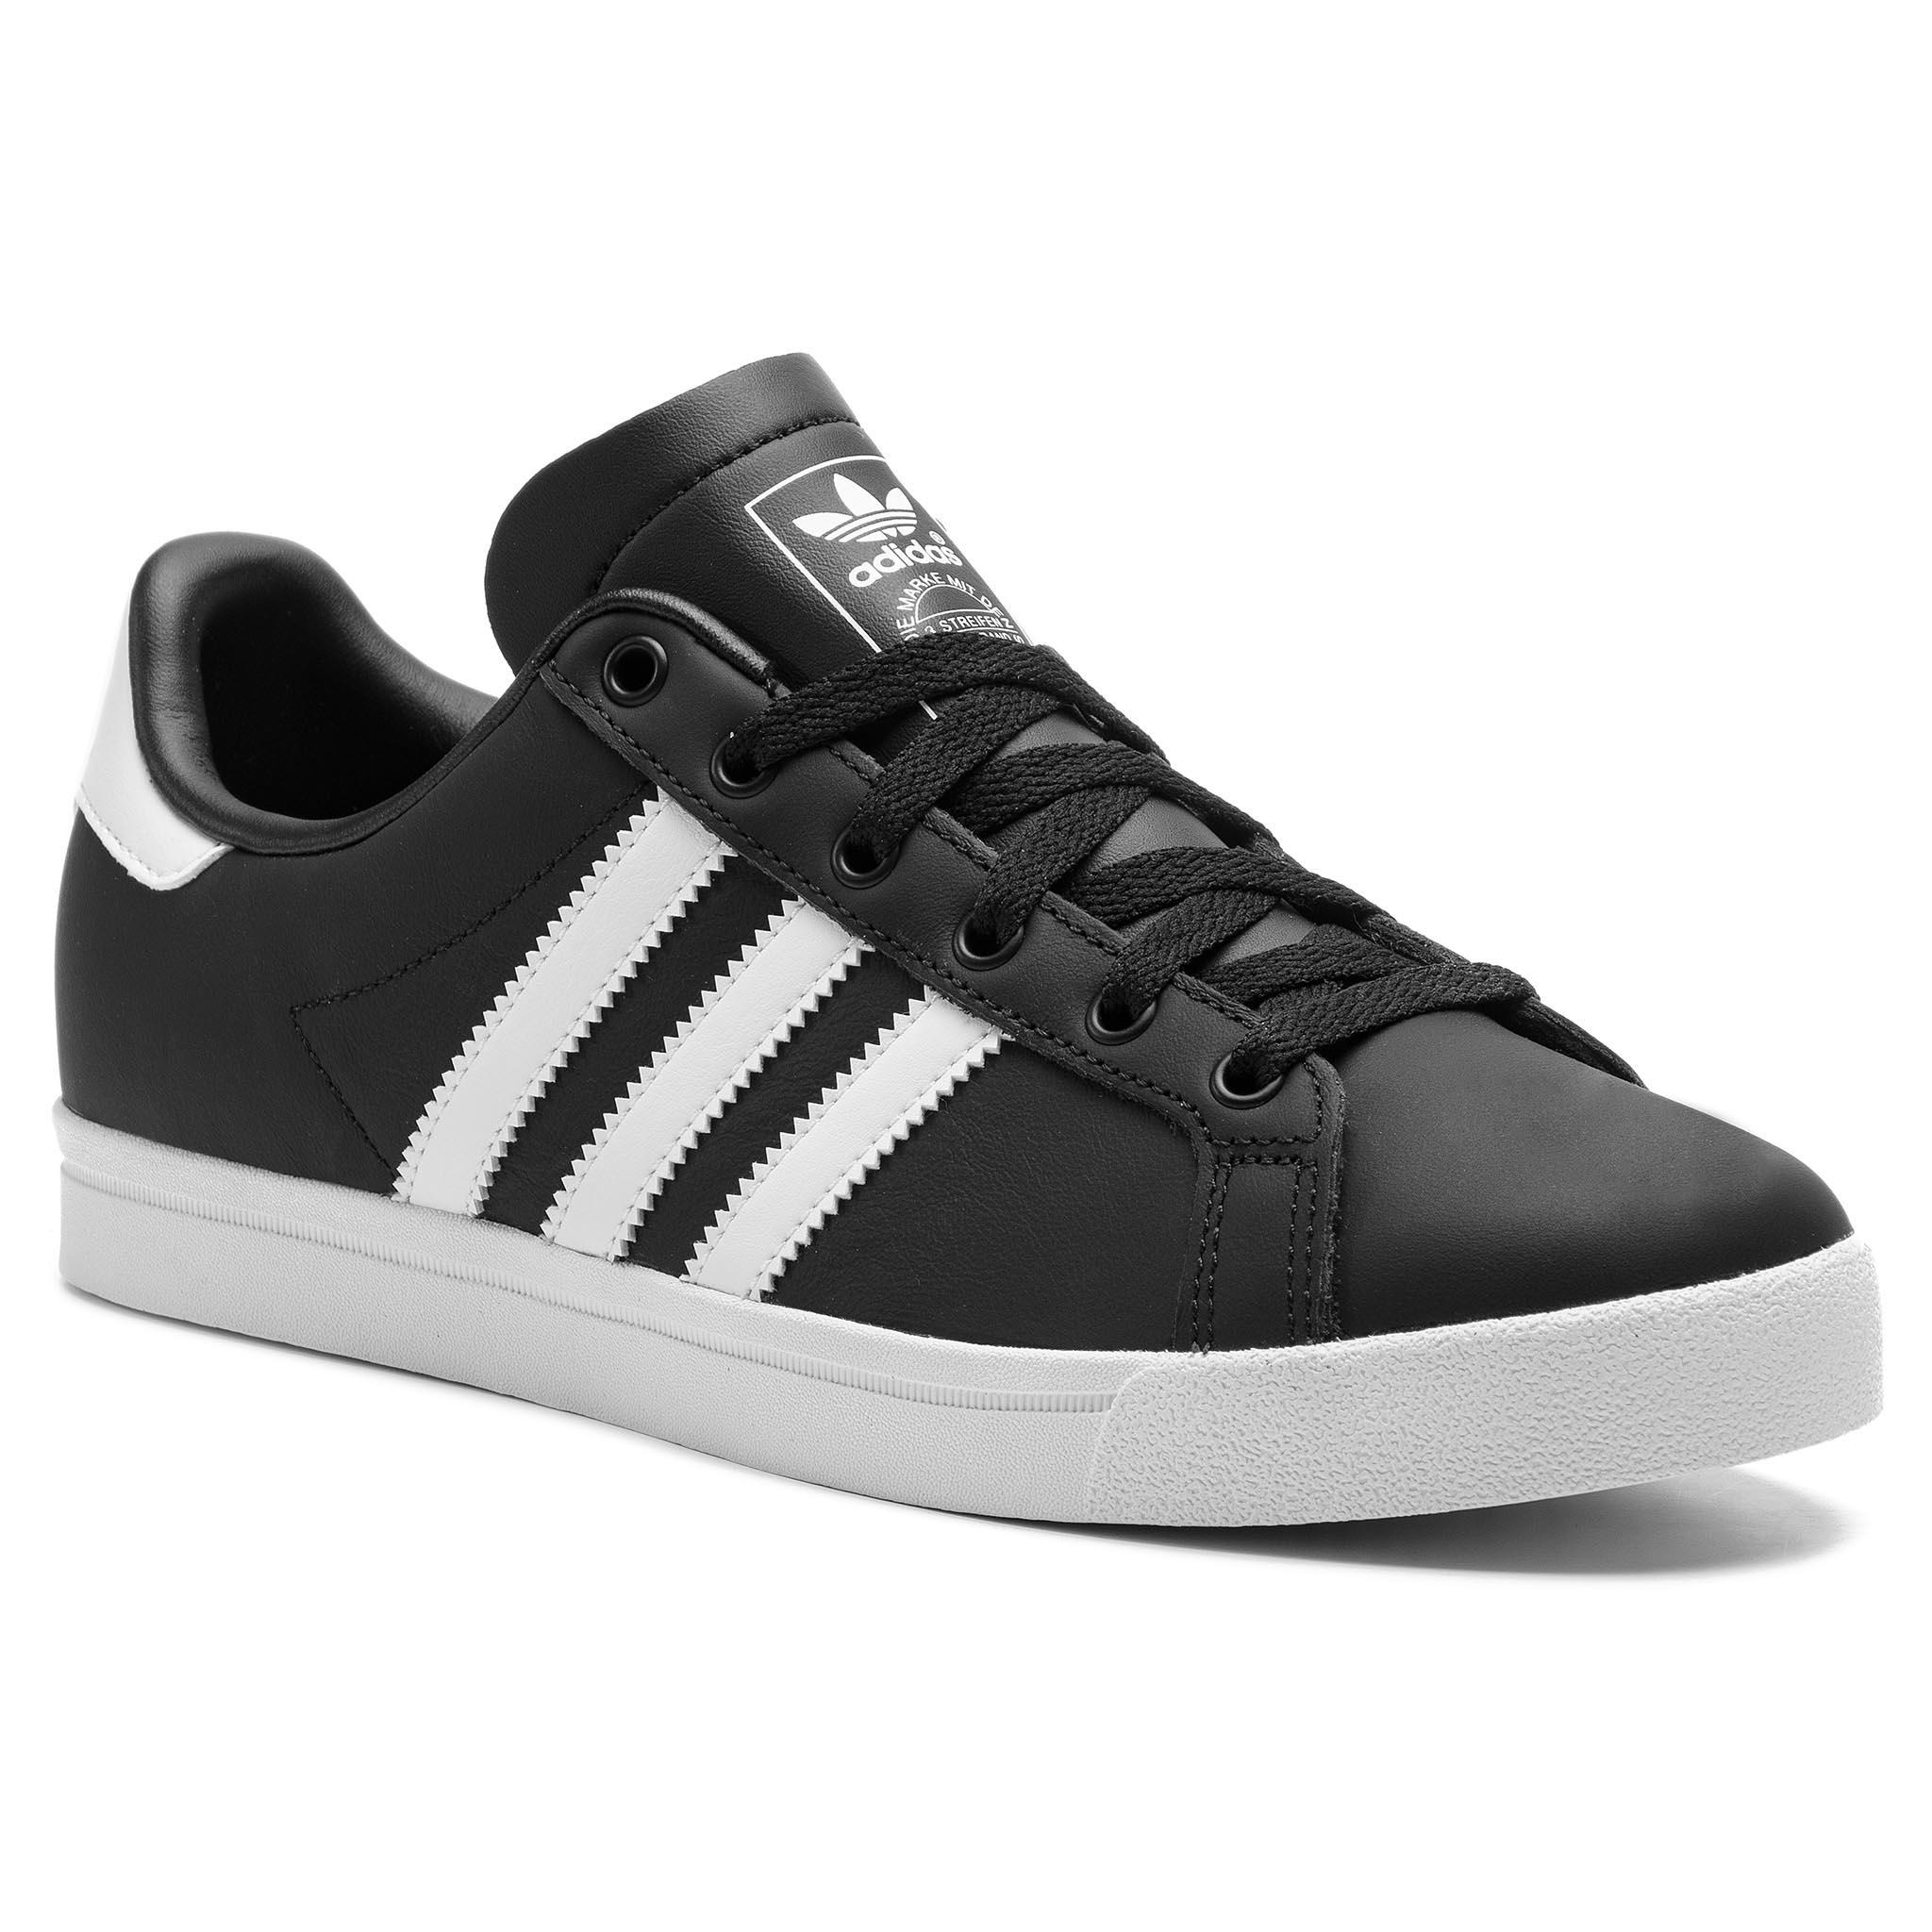 94dccc0fb9 Shoes adidas - Coast Star EE8900 Ftwwht/Cblack/Ftwwht - Sneakers ...